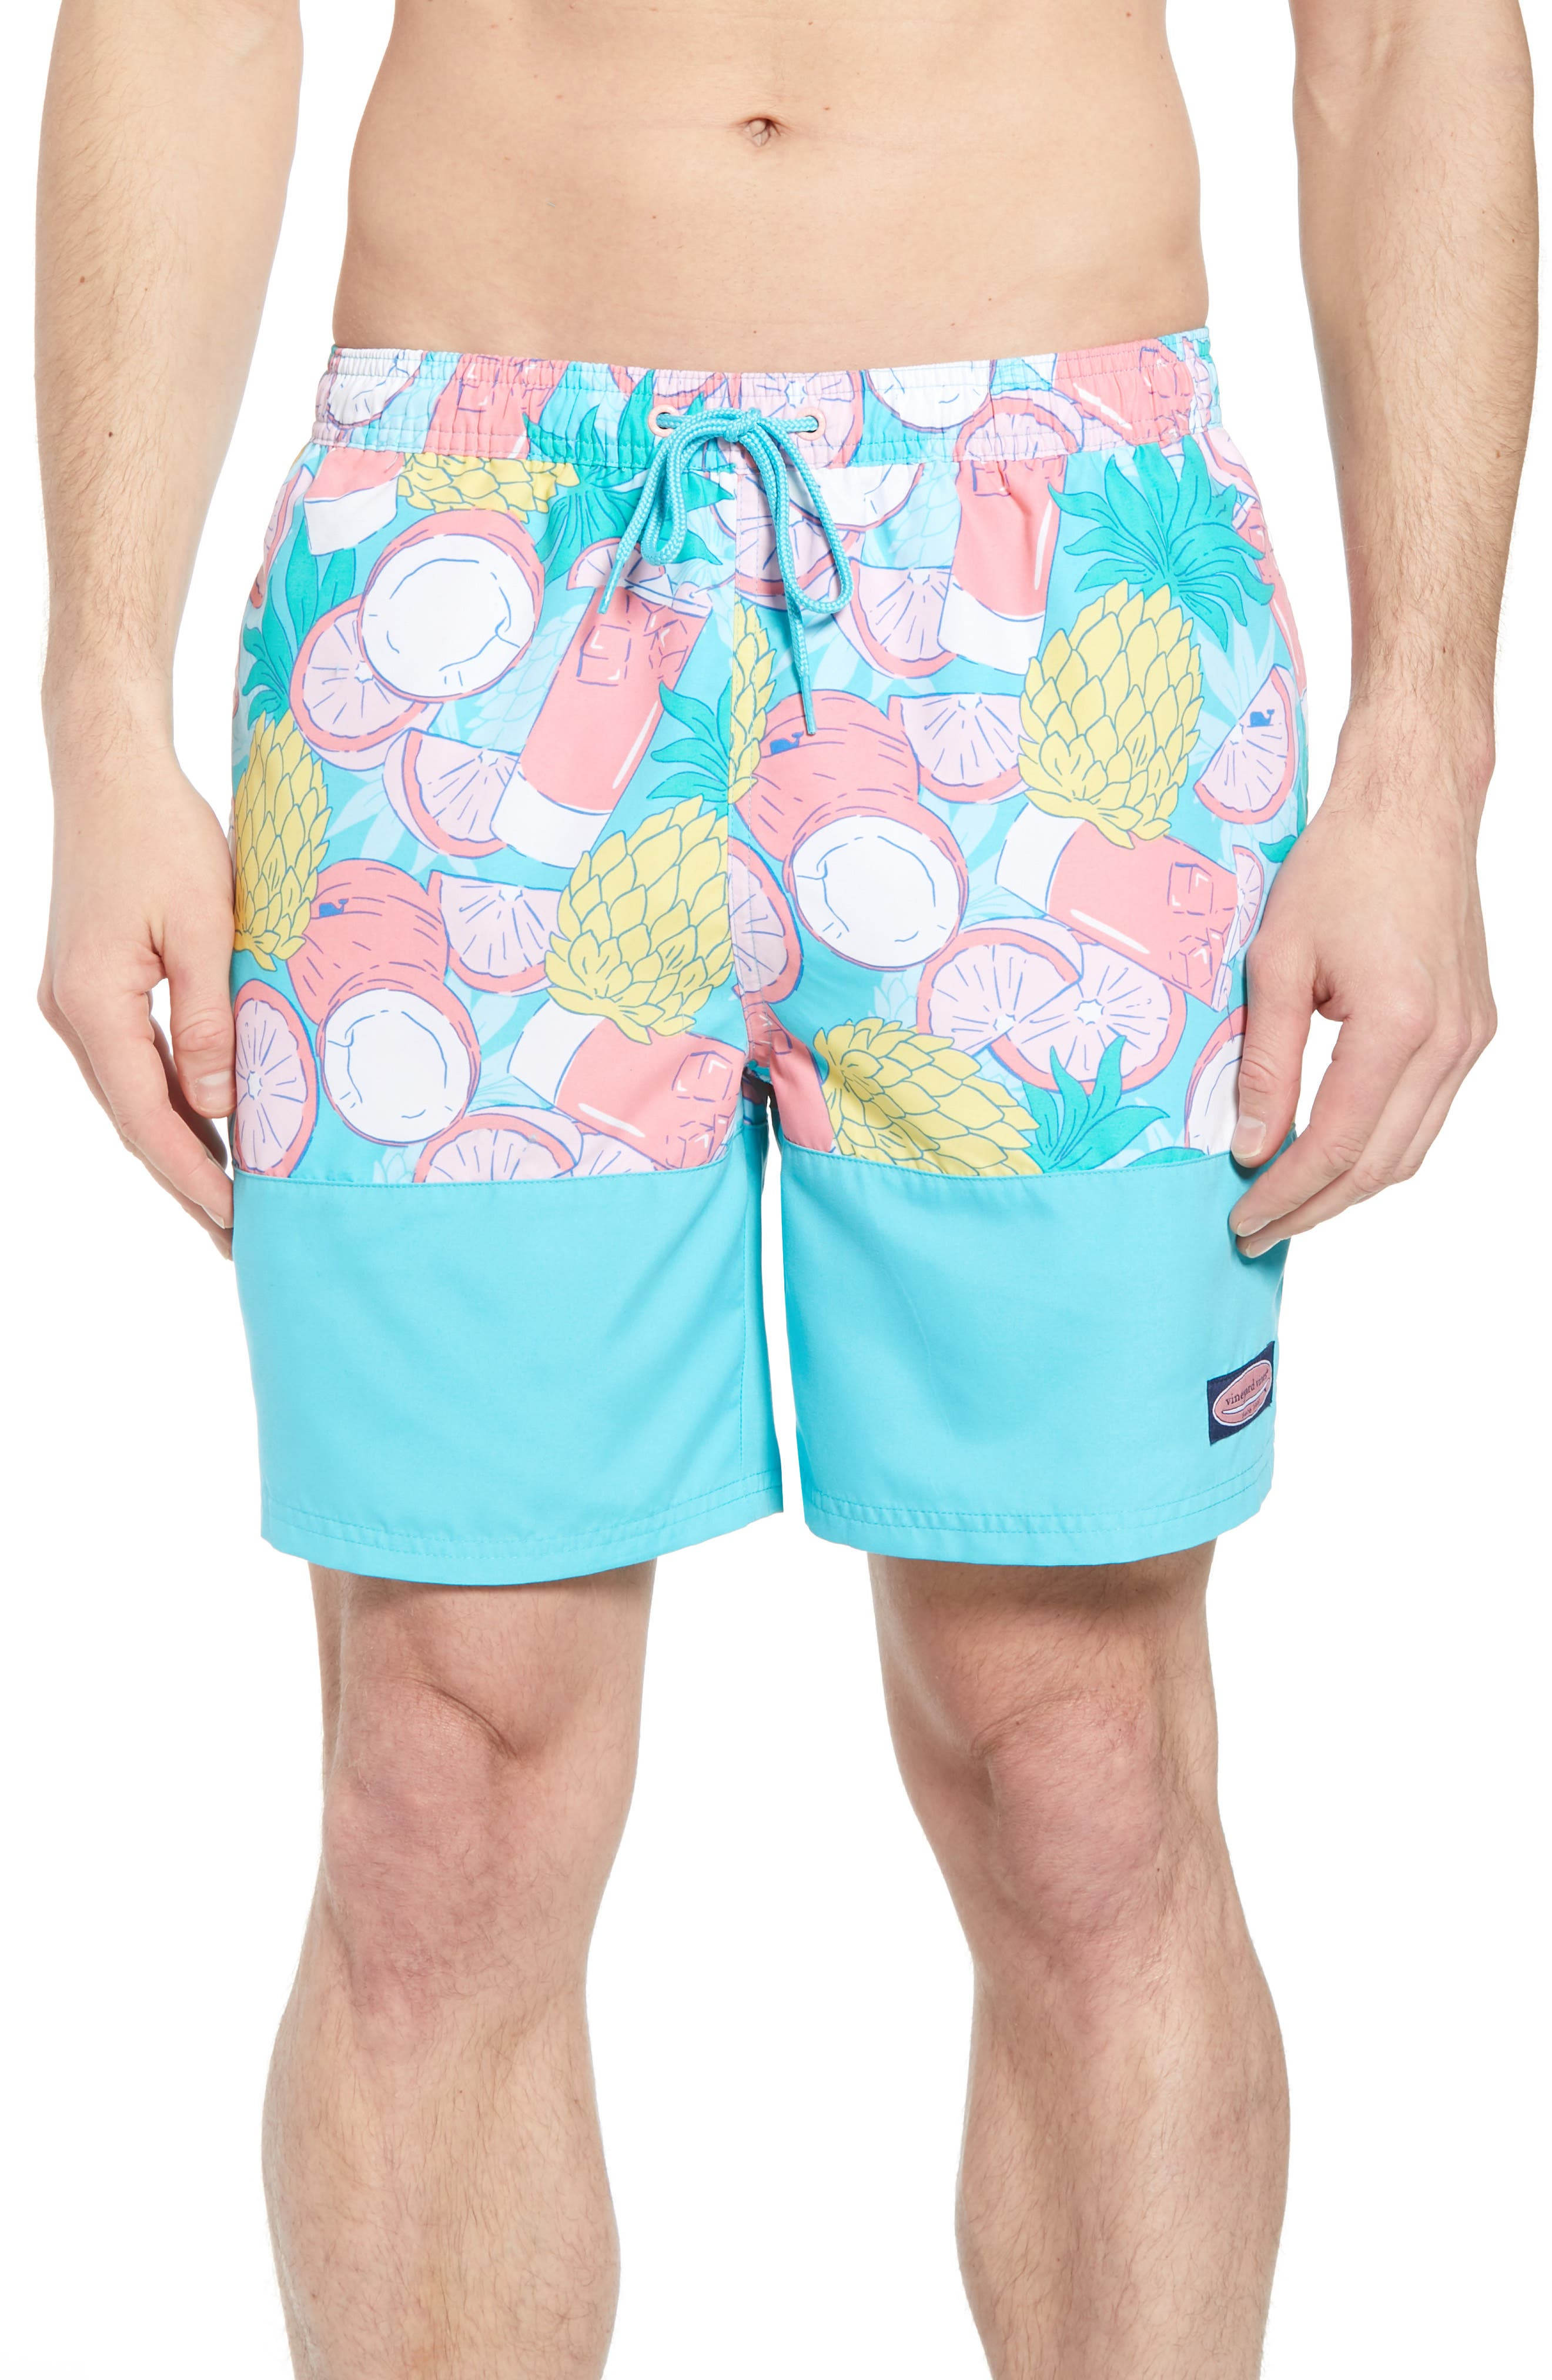 Chappy Pieced Bahama Mama Swim Trunks,                         Main,                         color, Turquoise